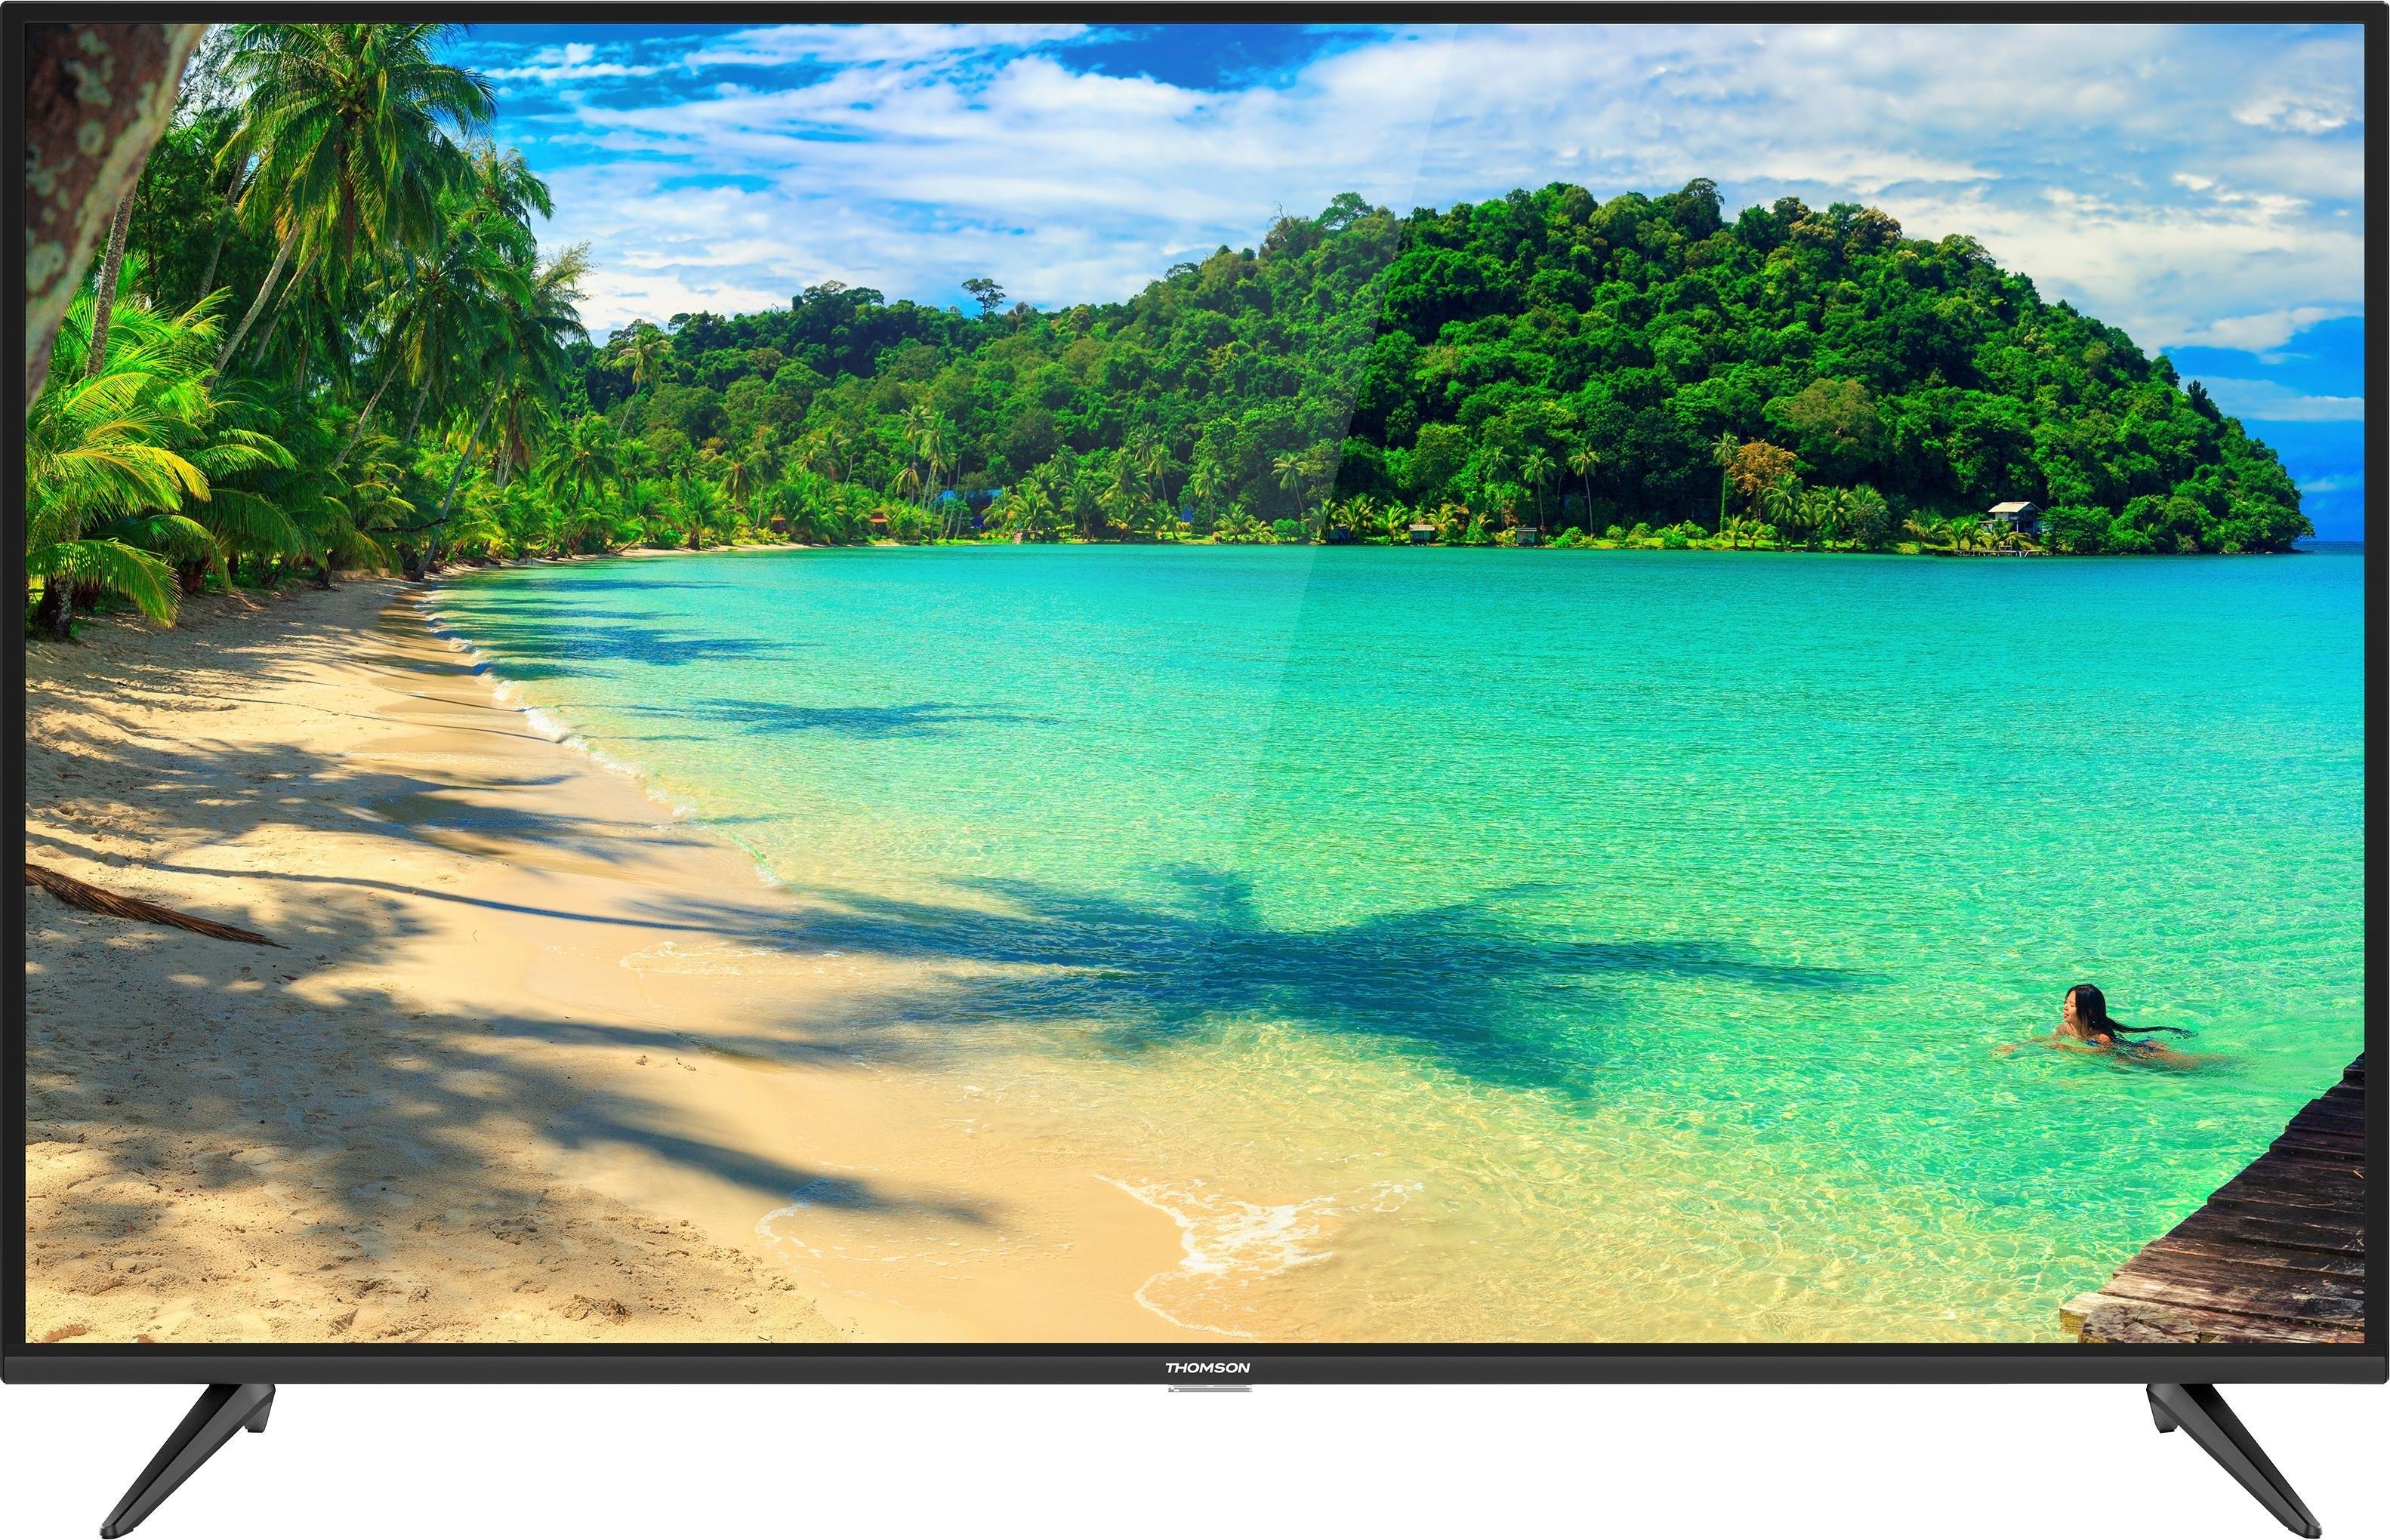 Thomson 43UD6326 led-tv (43 inch), 4K Ultra HD, smart-tv - gratis ruilen op otto.nl